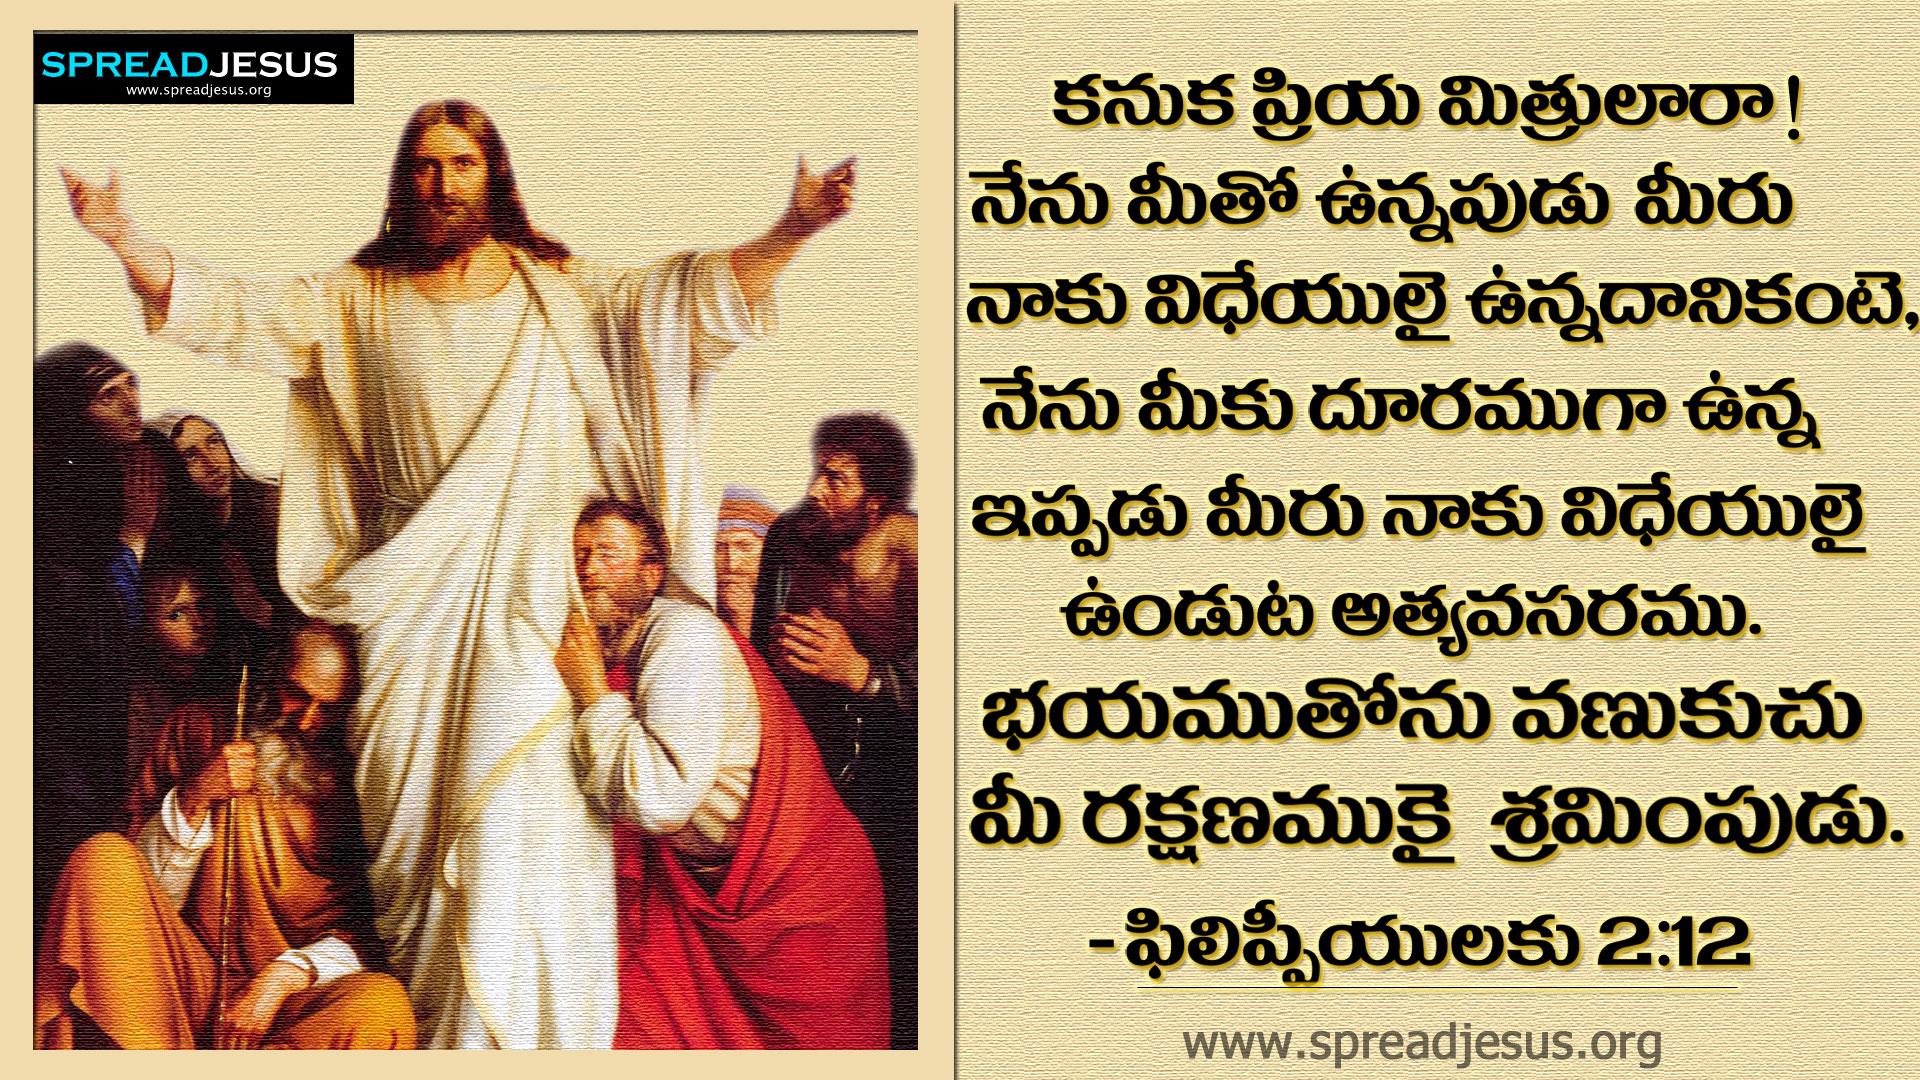 Telugu Bible Quotes Hd Wallpapers Philippiyulaku 2 12 Free Download